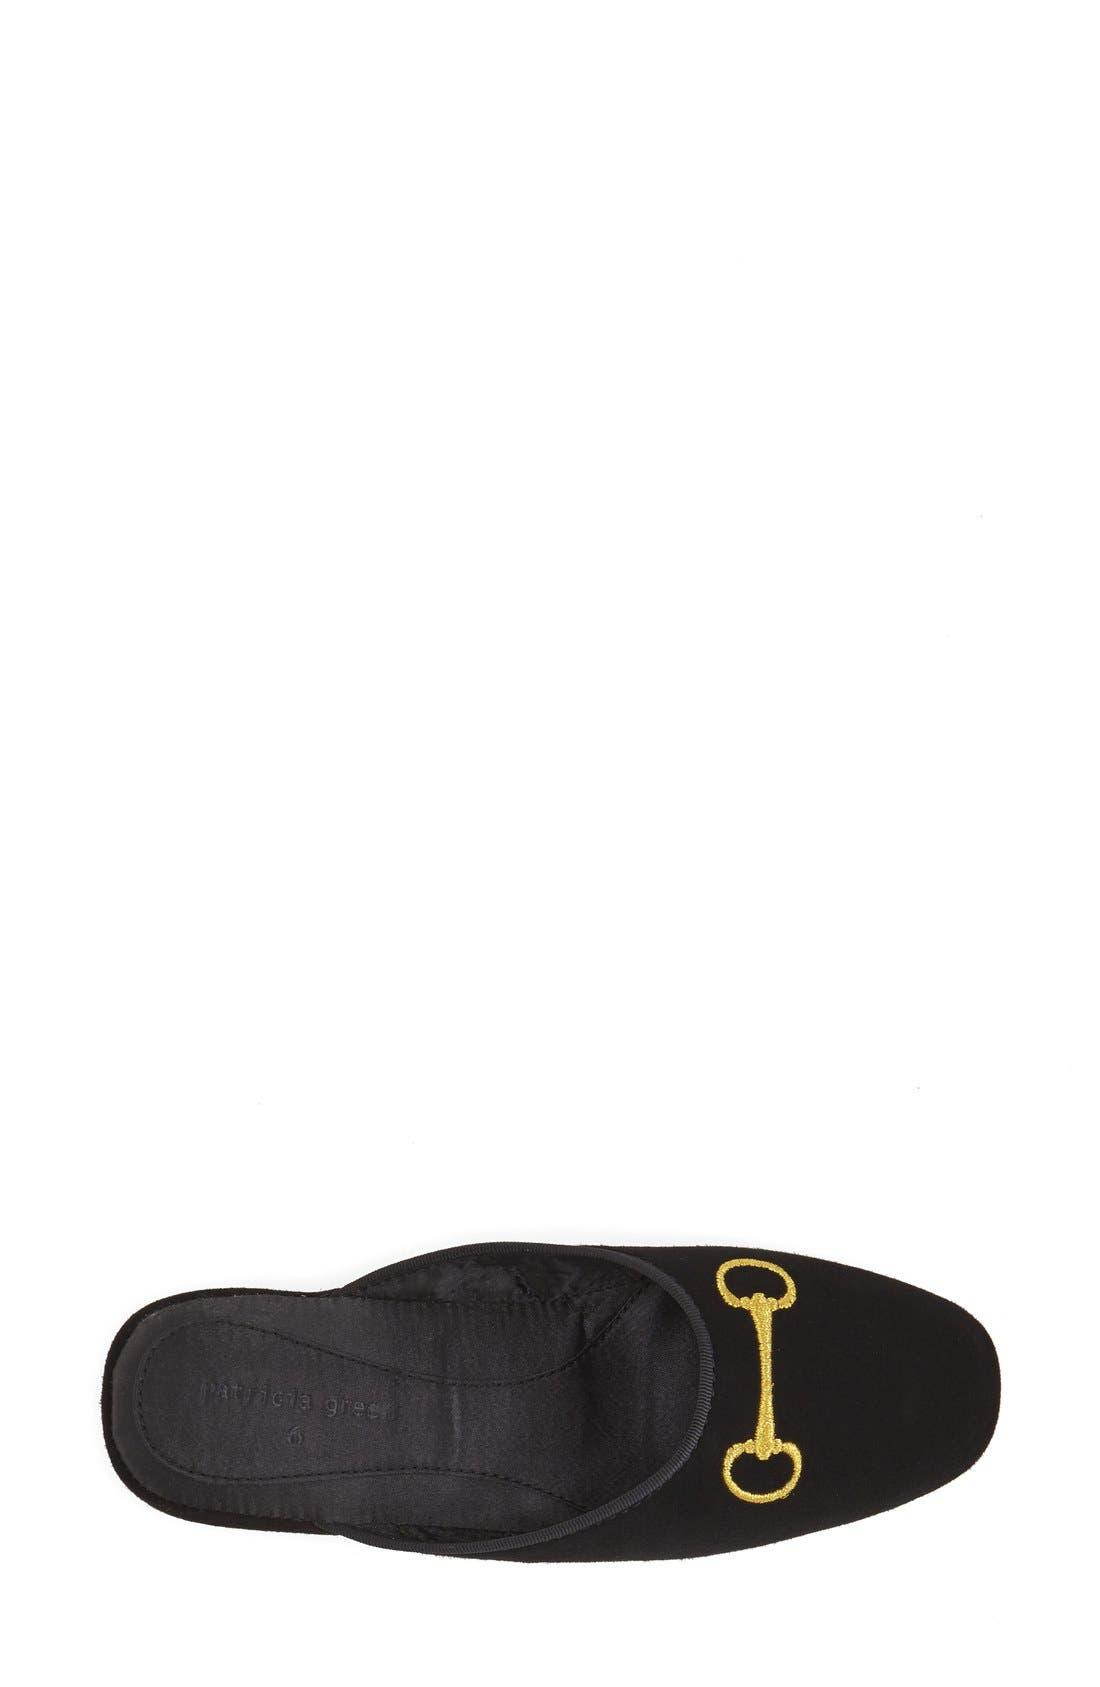 'Milano' Bit Embroidered Slipper,                             Alternate thumbnail 3, color,                             BLACK